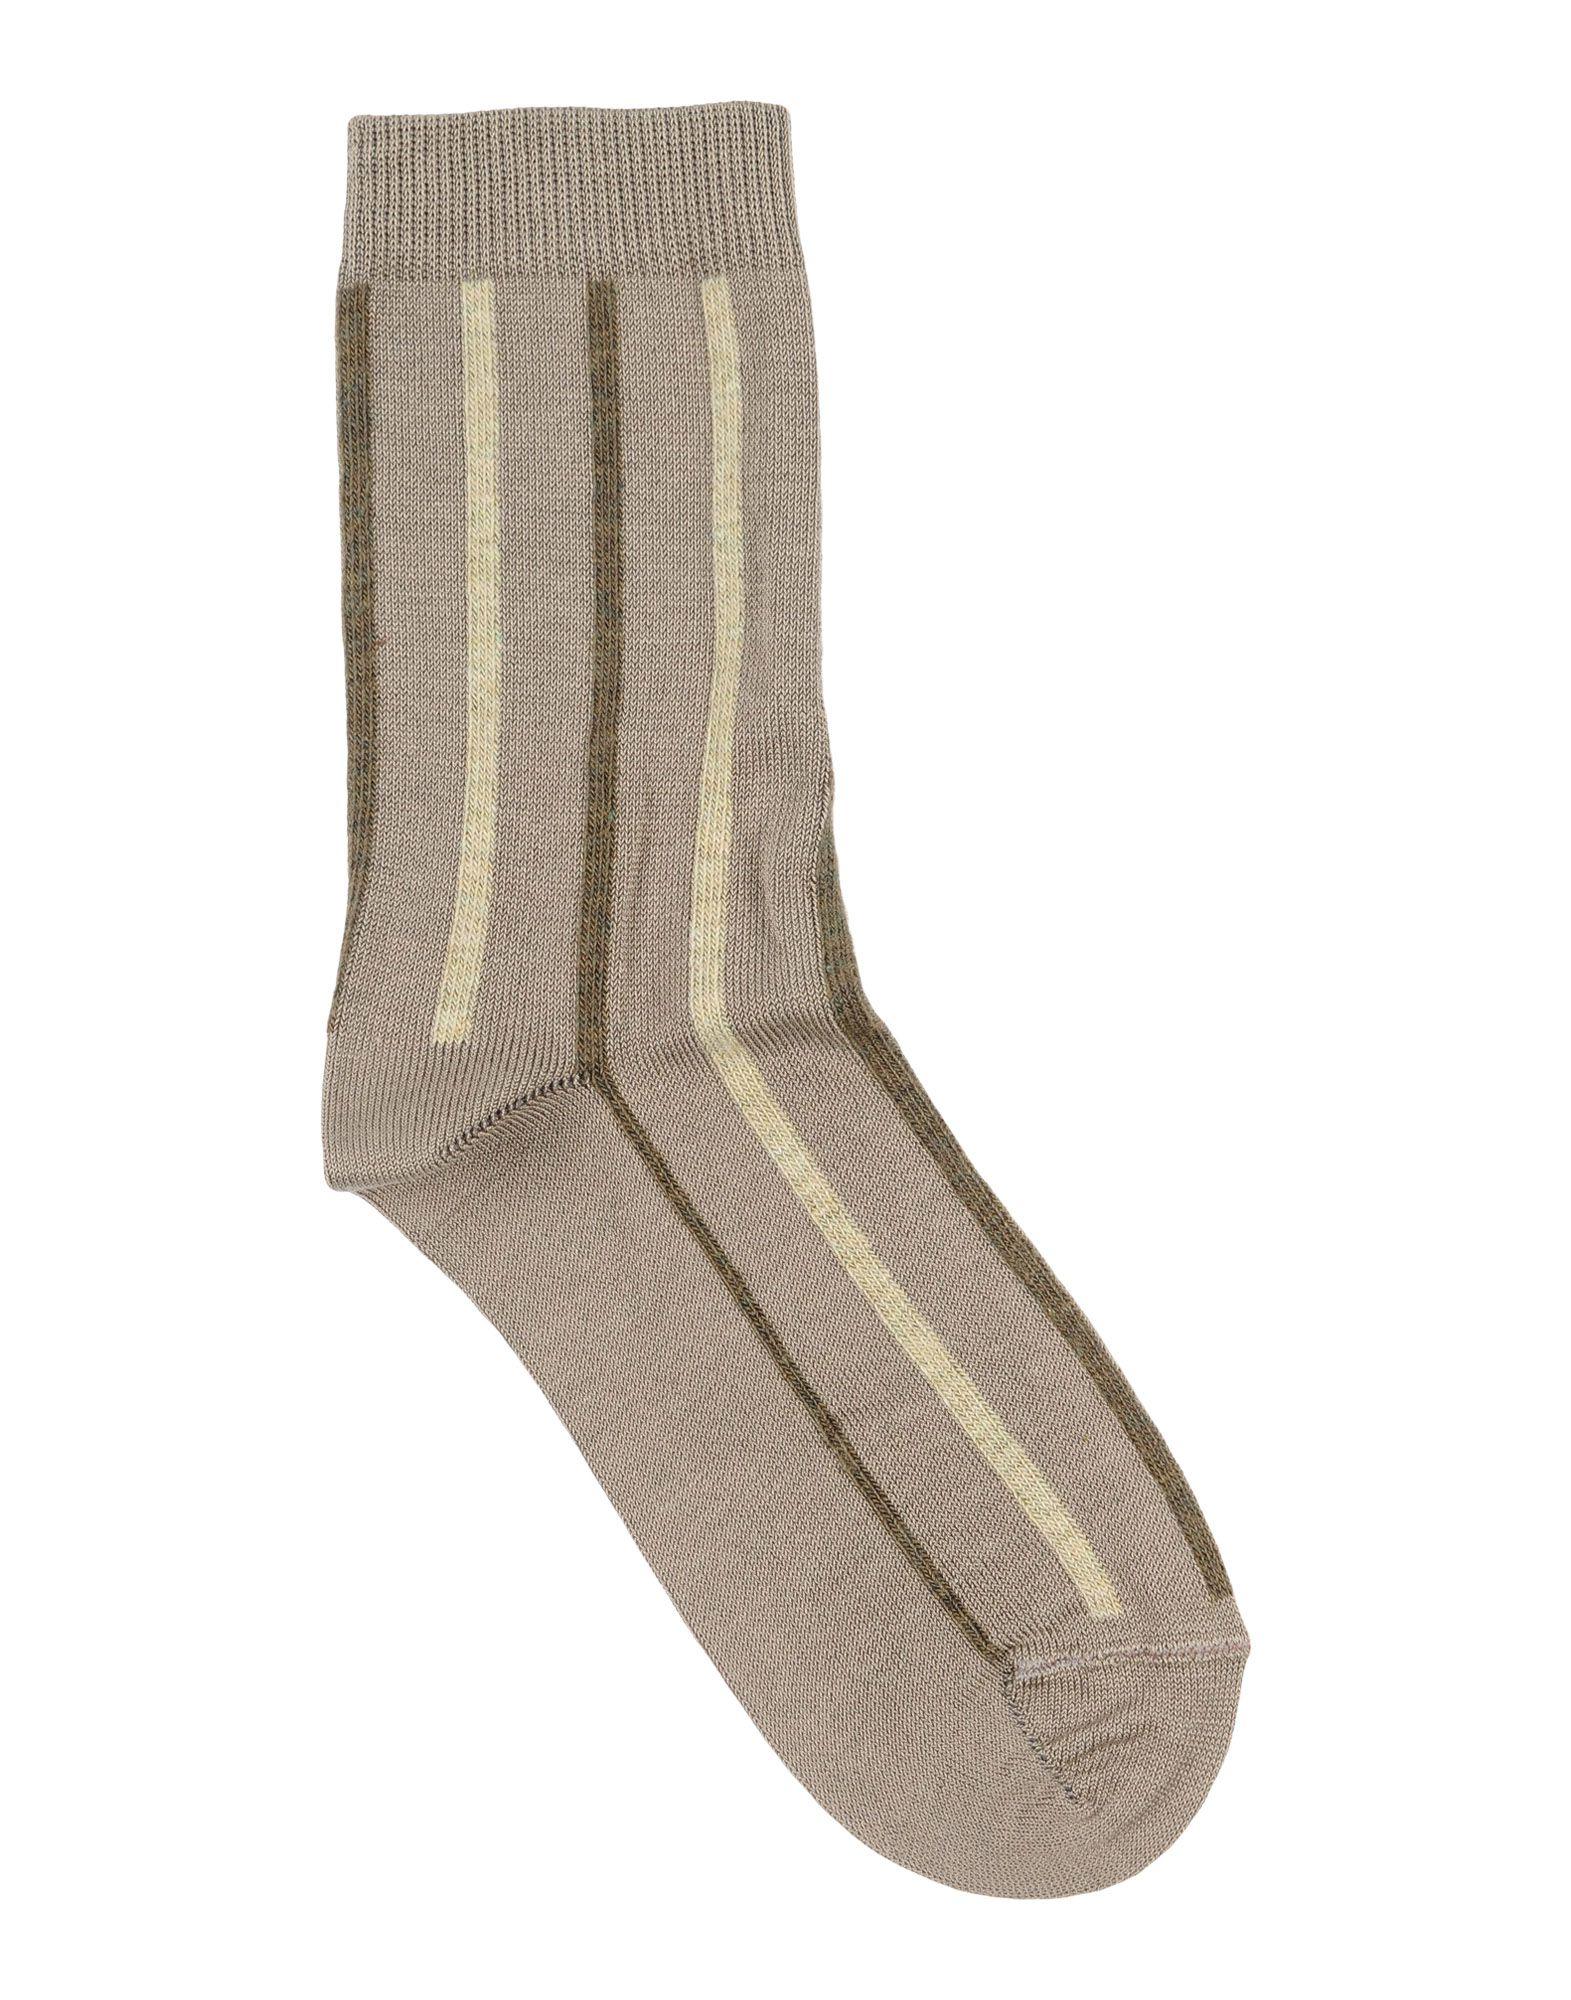 LA PERLA Short socks